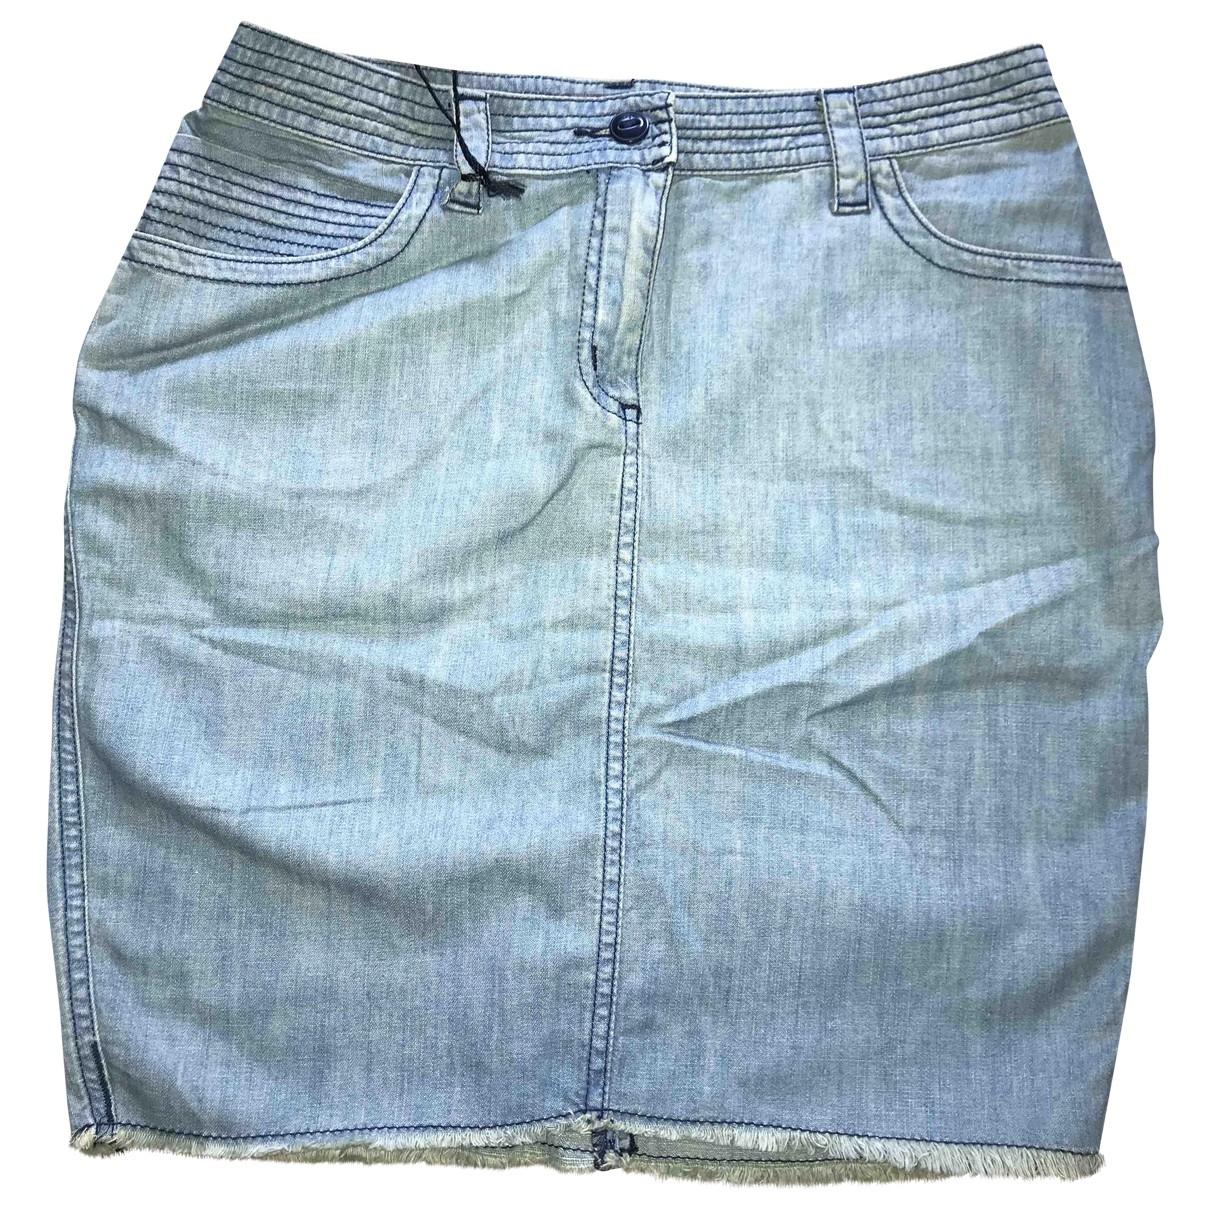 Zadig & Voltaire \N Blue Cotton skirt for Women 34 FR